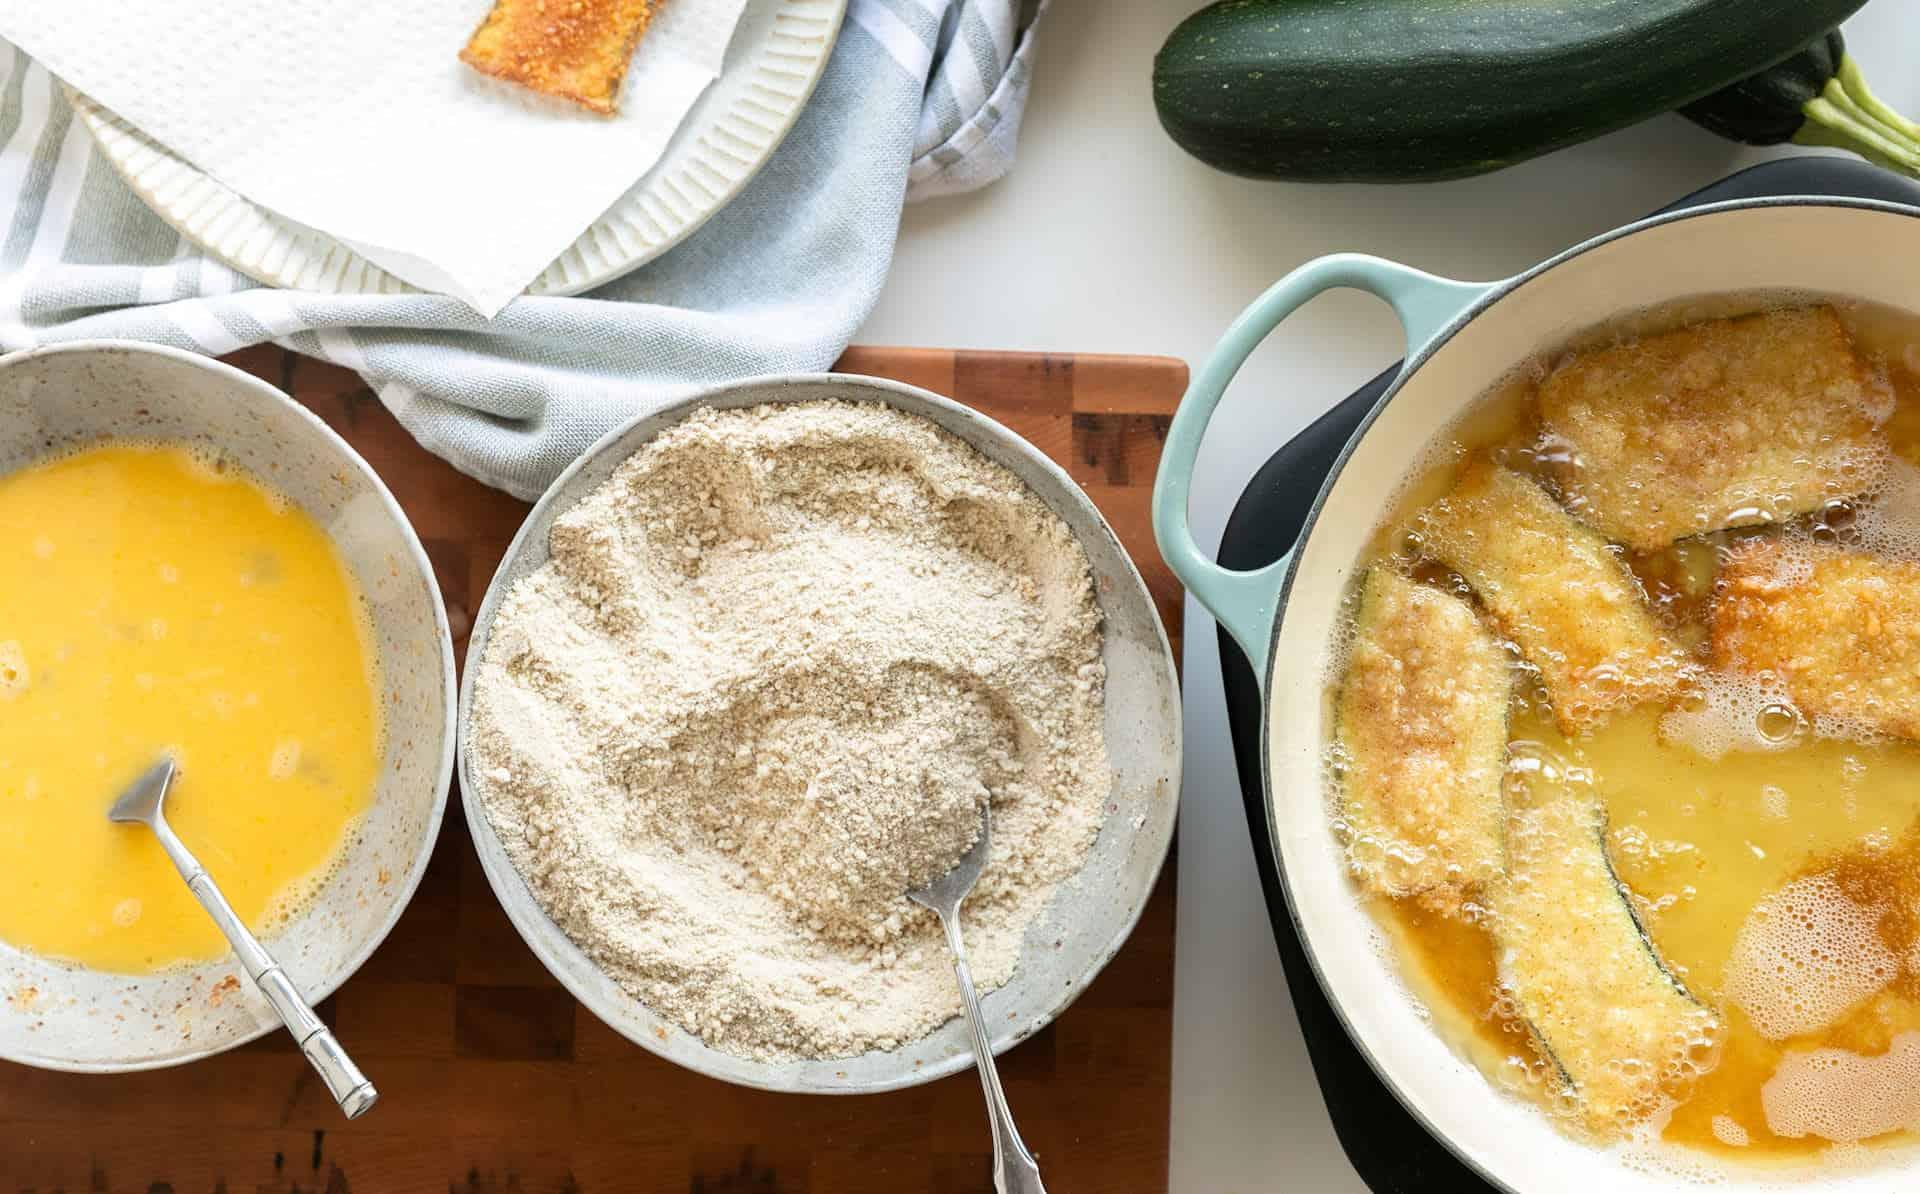 Overhead image of eggwash, breading and frying of Crispy Fried Zucchini with Marinara